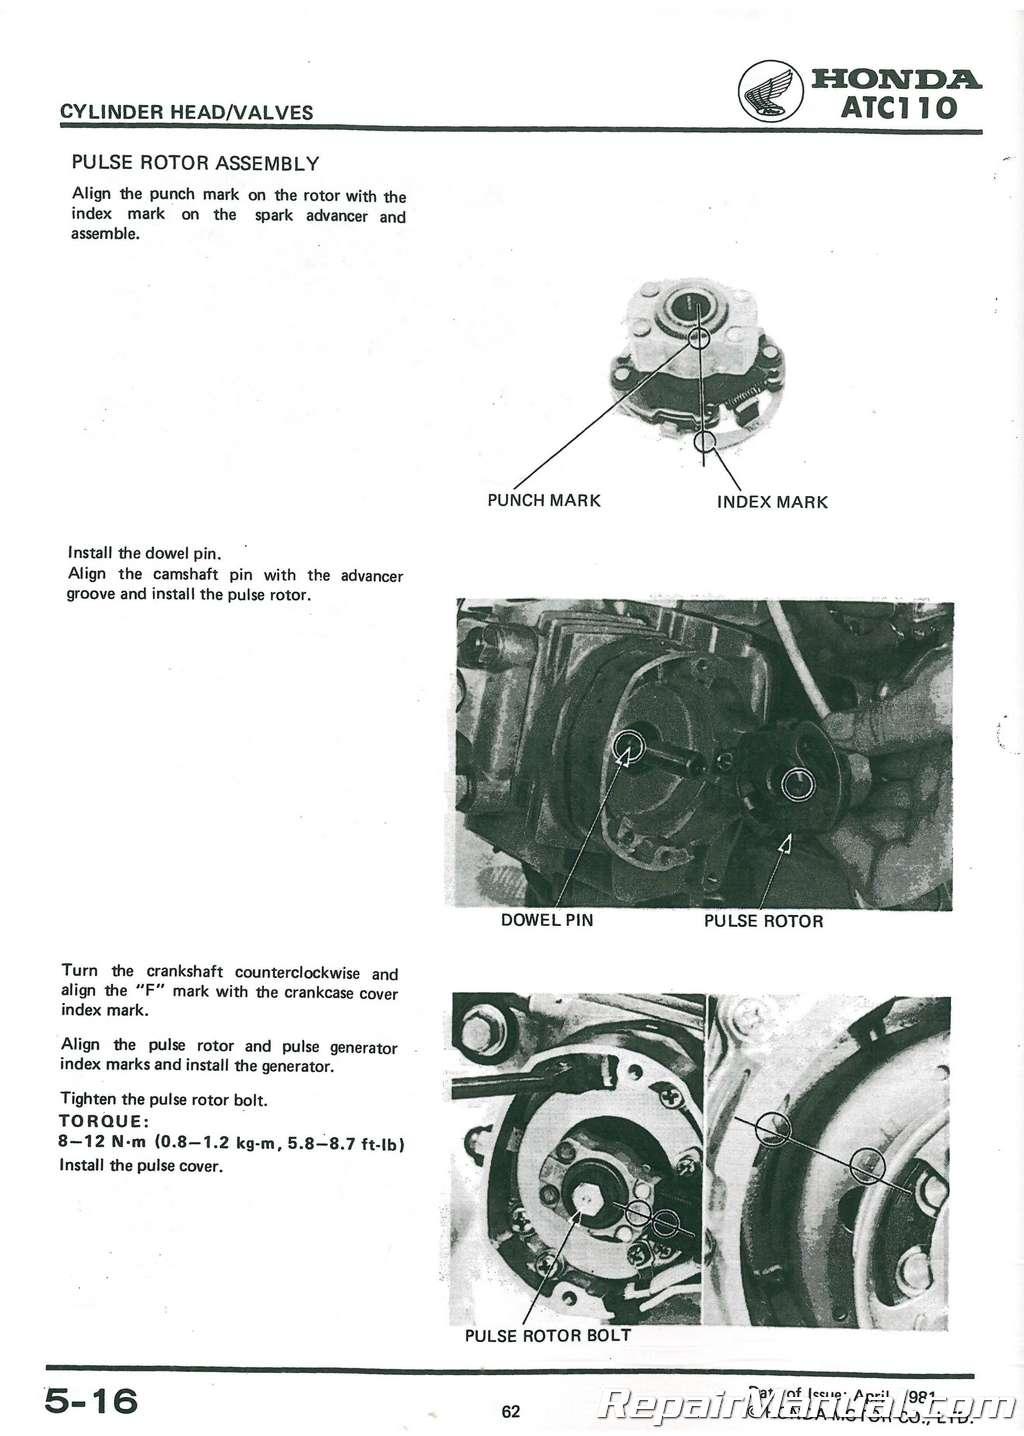 1981 1984 honda atc110 all terrain cycle service manual rh repairmanual com honda atc 110 service manual pdf honda atc 110 manual download